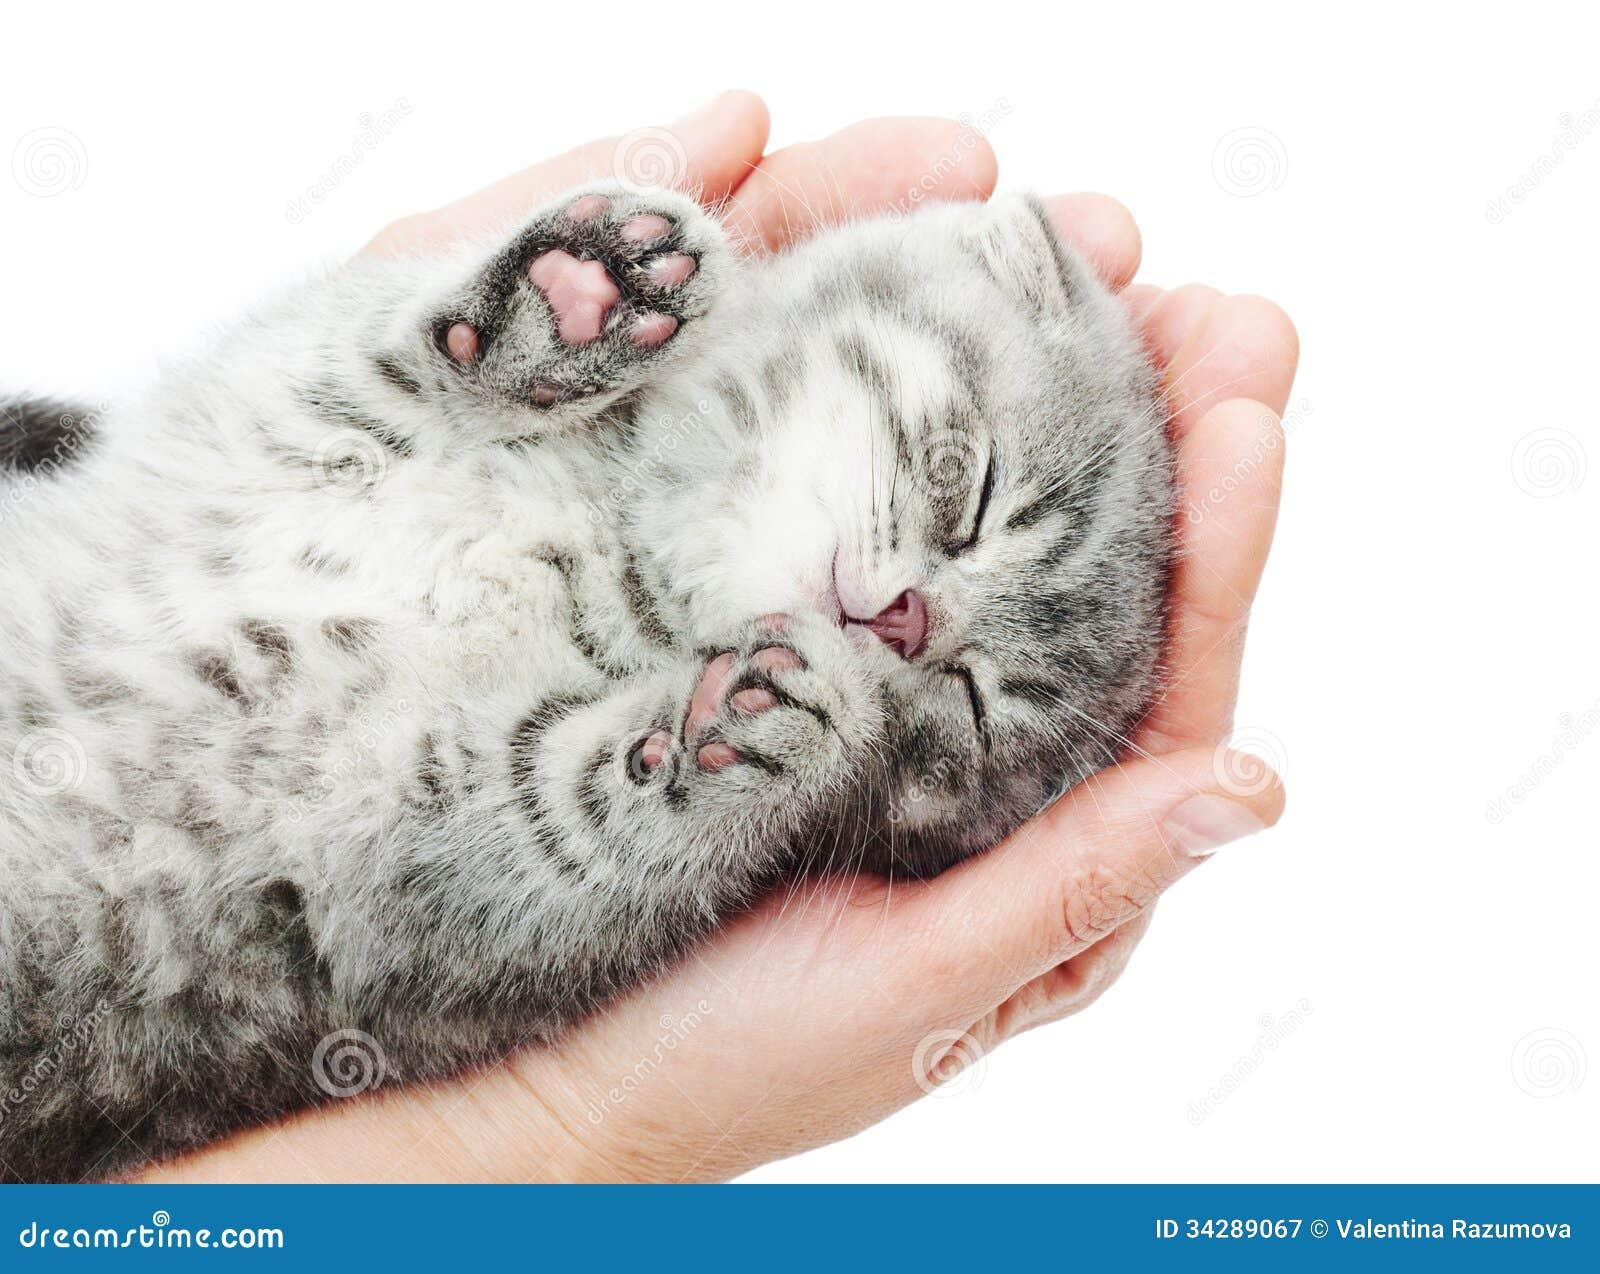 Sleeping Kitten On Hand Royalty Free Stock Photography ... Tabby Cat Sitting Up